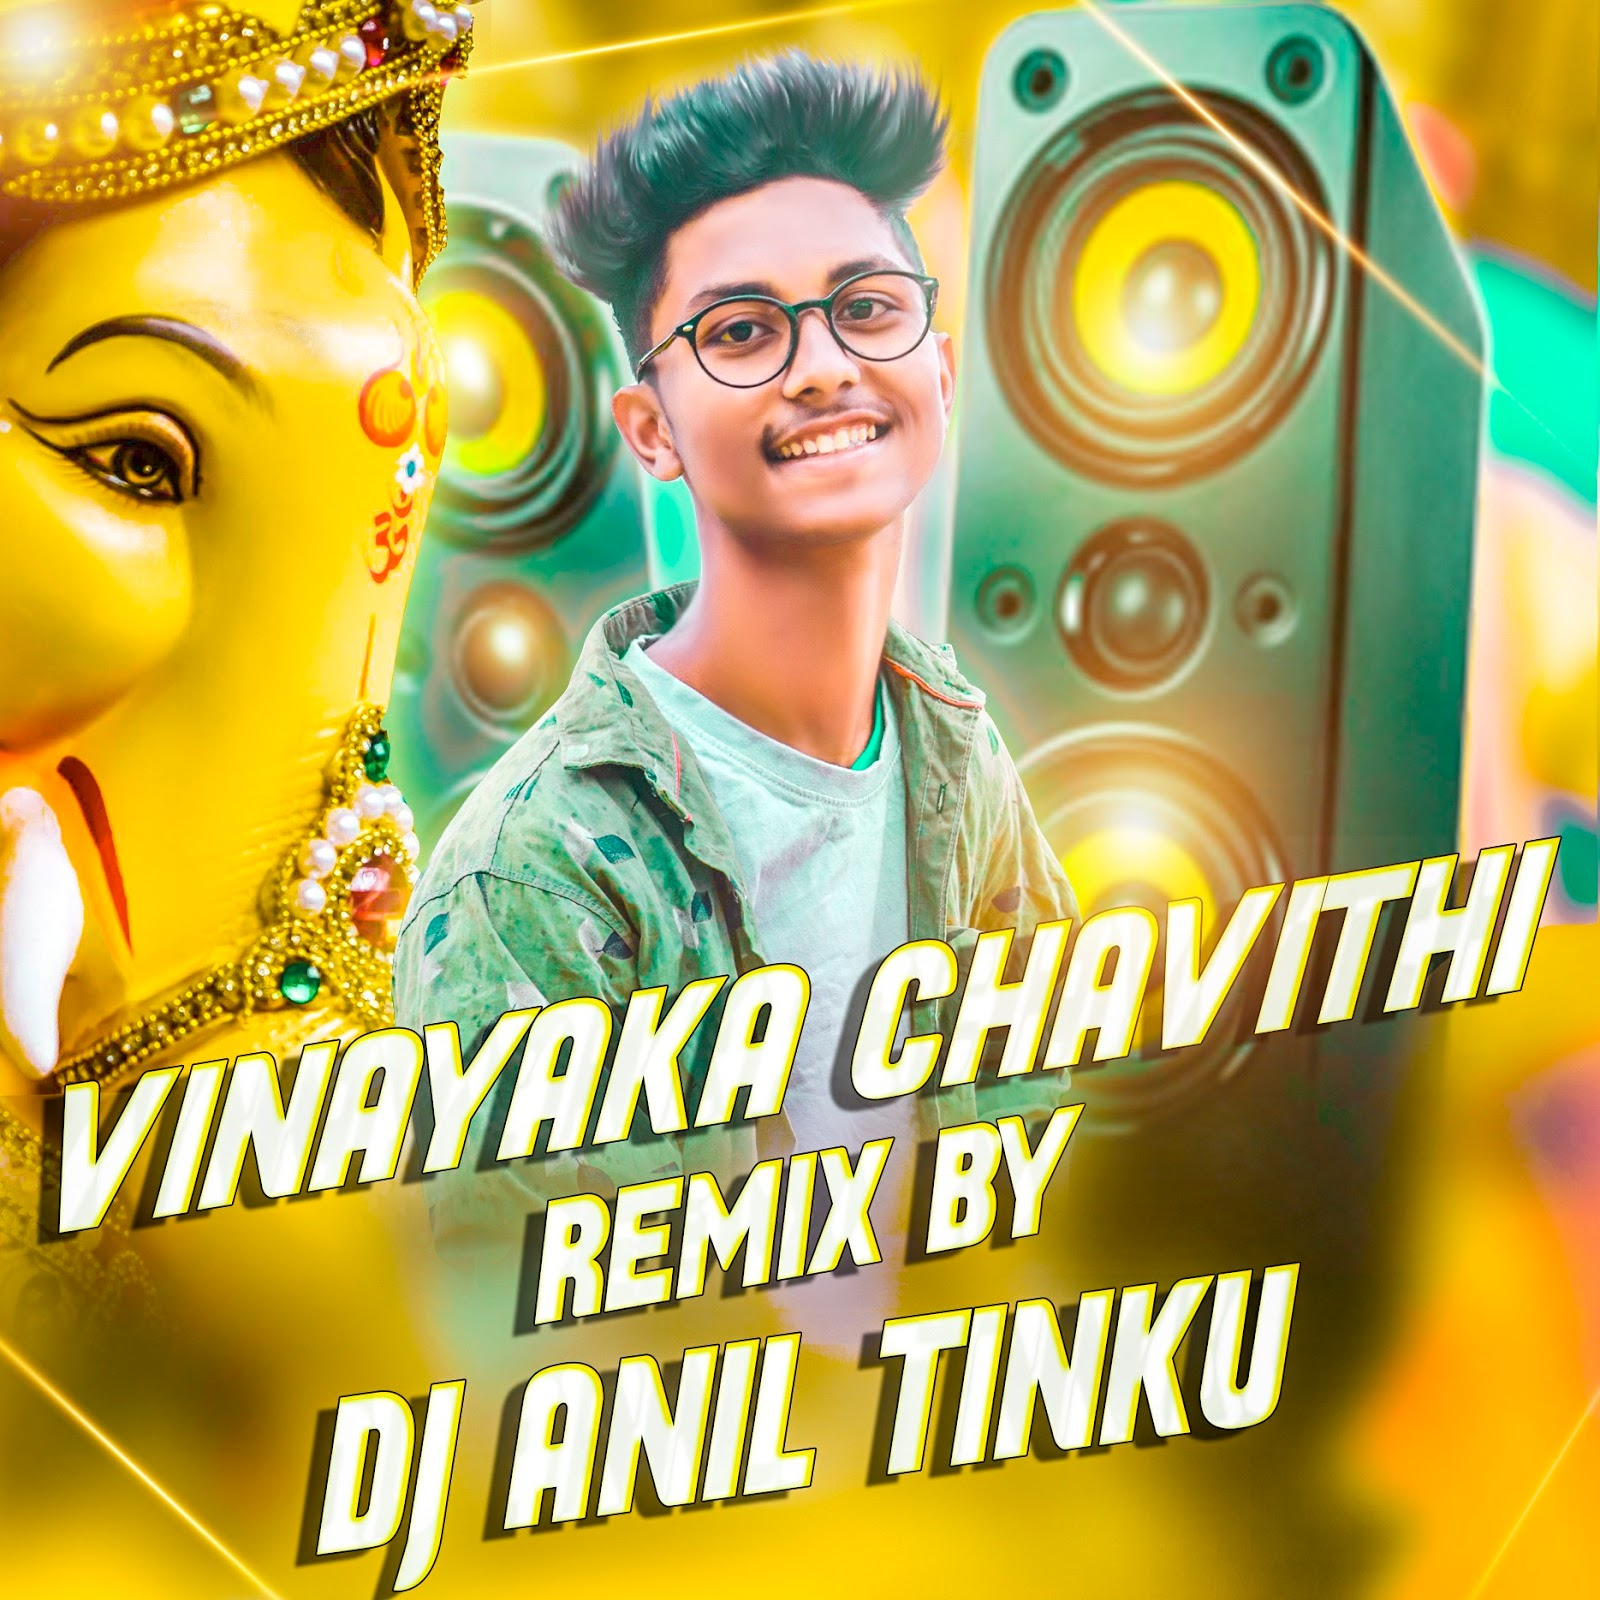 Vinayaka Chavithi Dj Songs, Vinayaka Chavithi Dj Dance Telugu, Vinayaka Chavithi Dj Songs Remix, Vinayaka Chavithi Dj Songs Telugu Dance, Vinayaka Chavithi Dj Songs Dance, Vinayaka Chavithi Dj Songs 2018, Vinayaka Chavithi Dj Dance, Vinayaka Chavithi Dj Songs 2019, Vinayaka Chavithi Dj Whatsapp Status, Dj Songs For Vinayaka Chavithi, Dj For Vinayaka Chavithi, Vinayaka Chavithi Dj Songs Telugu, Vinayaka Chavithi Songs 2019 Dj, Vinayaka Chavithi Special Dj Songs 2018,Vinayaka Chavithi Dj Songs, Vinayaka Chavithi Dj Songs Download, Vinayaka Chavithi Dj Naa Songs, Vinayaka Chavithi Dj Songs 2018, Vinayaka Chavithi Dj Songs Telugu, Vinayaka Chavithi Dj Songs Telugu Free Download, Vinayaka Chavithi Dj Naa Songs Download, Vinayaka Chavithi Dj Songs Download In Telugu, Vinayaka Chavithi Dj Songs Mp3 Download, Vinayaka Chavithi Dj Songs All, Vinayaka Chavithi Dj Box, Vinayaka Chavithi Dj Songs Com, Vinayaka Chavithi Dj Songs Please Come, Vinayaka Chavithi Dj Naa Songs Com, Vinayaka Chavithi Telugu Dj Songs Com, Vinayaka Chavithi Dj Songs Download Naa Songs, Vinayaka Chavithi Dj Songs Download Mp3, Vinayaka Chavithi Dj Songs Free Download Telugu, Vinayaka Chavithi Dj Remix Songs Download, Ganesh Chavithi Dj Songs Download, Vinayaka Chavithi Dj Songs 2018 Download, Vinayaka Chavithi Full Dj Song, Vinayaka Chavithi Special Folk Dj Songs, Vinayaka Chavithi Dj Songs In Telugu, Vinayaka Chavithi Dj Songs In 2018, Vinayaka Chavithi Songs In Dj, Vinayaka Chavithi Special Dj Songs In Telugu, Jai Vinayaka Chavithi Dj Song, Vinayaka Chavithi Latest Dj Songs, Vinayaka Chavithi Dj Songs Telugu Lo, Vinayaka Chavithi Dj Mp3 Songs, Vinayaka Chavithi Dj Mp3 Songs Download, Vinayaka Chavithi Dj Mix Songs, Vinayaka Chavithi Telugu Dj Mp3 Songs, Vinayaka Chavithi Dj Naa Songs 2018, Vinayaka Chavithi New Dj Songs, Vinayaka Chavithi Nimajjanam Dj Songs, Vinayaka Chavithi New Dj Songs 2018, Vinayaka Chavithi New Dj Naa Songs, Vinayaka Chavithi Nimajjanam Dj, Vinayaka Chavithi Pandaga Dj Songs, Vin